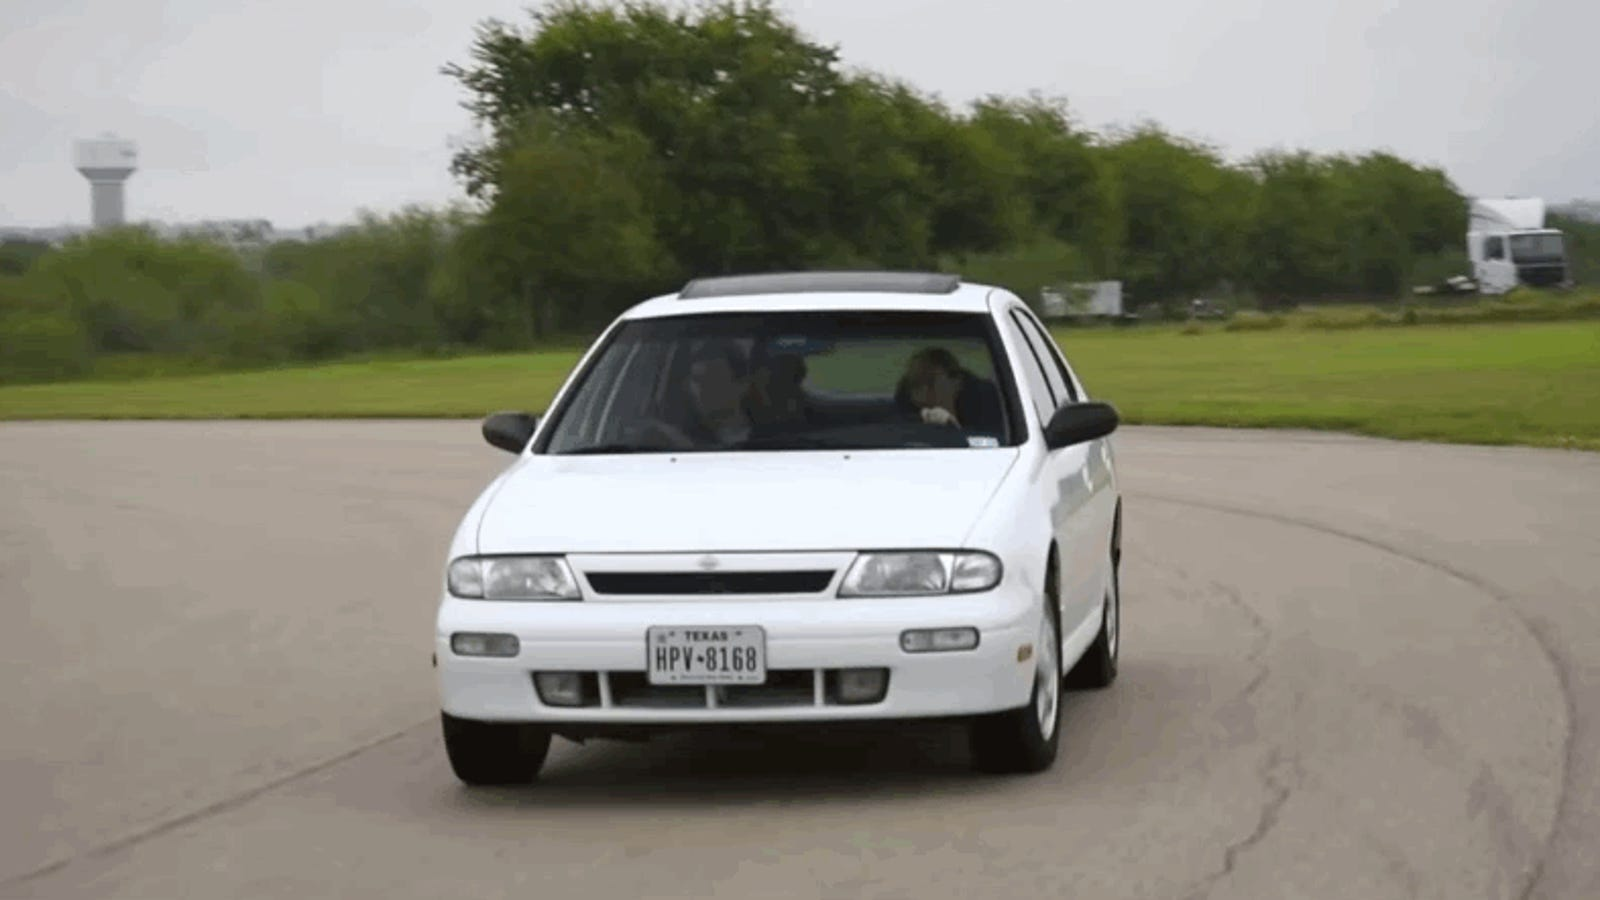 The Nissan Altima Wasn't Always Just a Rental Car